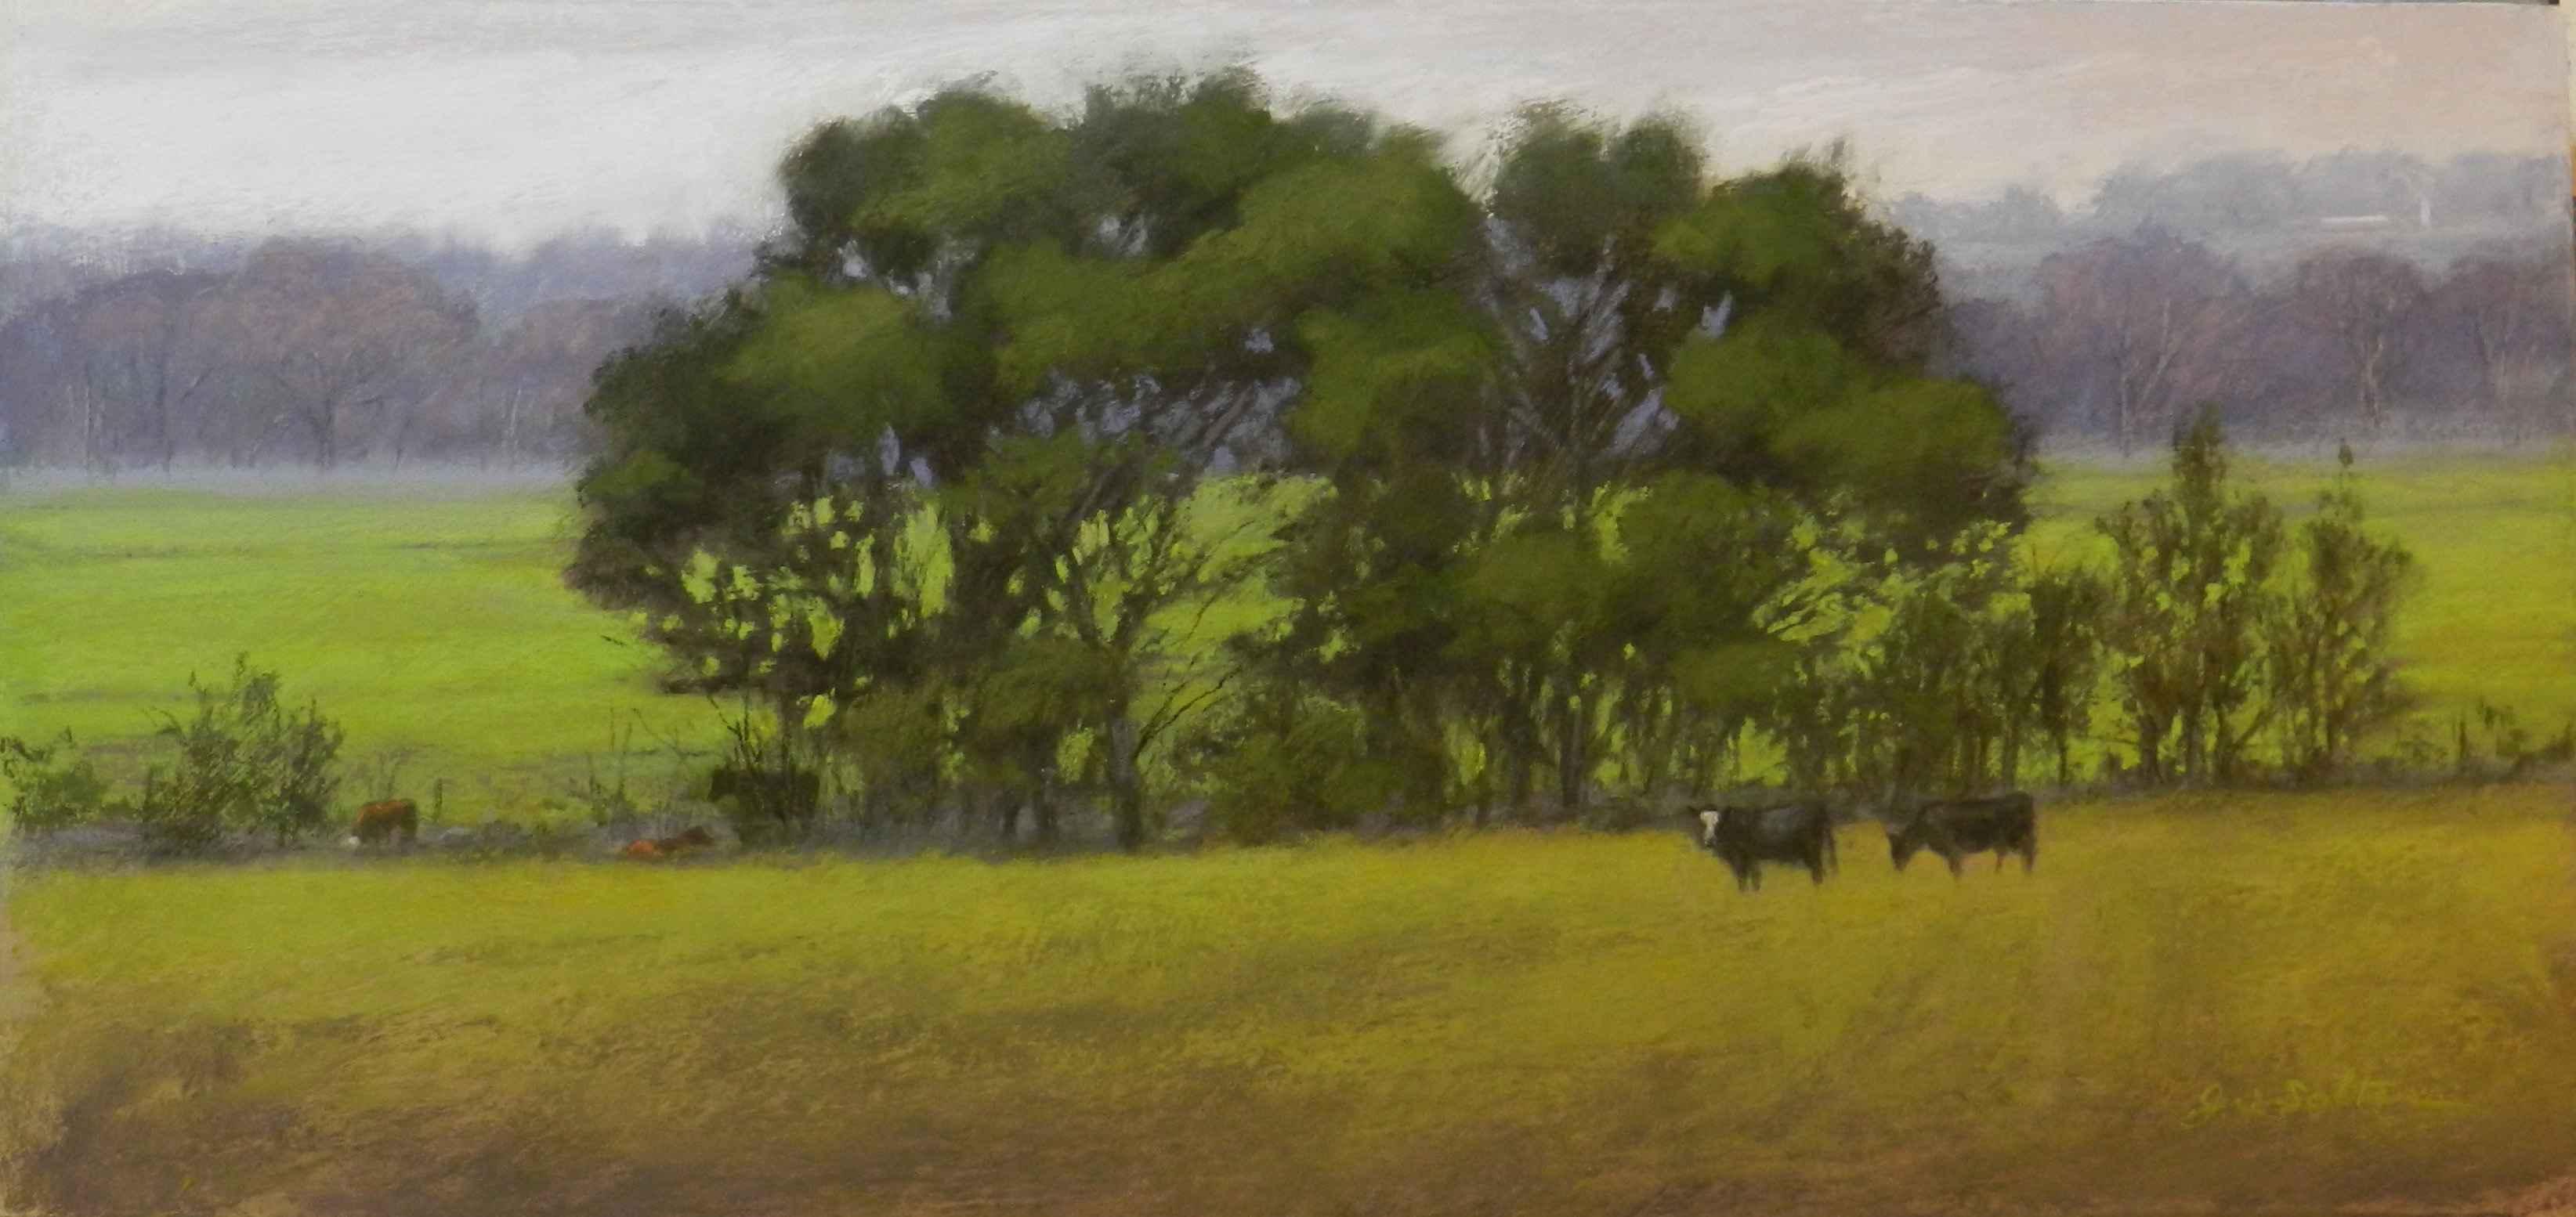 Verdant Pastures by Mrs. Jeri Salter - Masterpiece Online